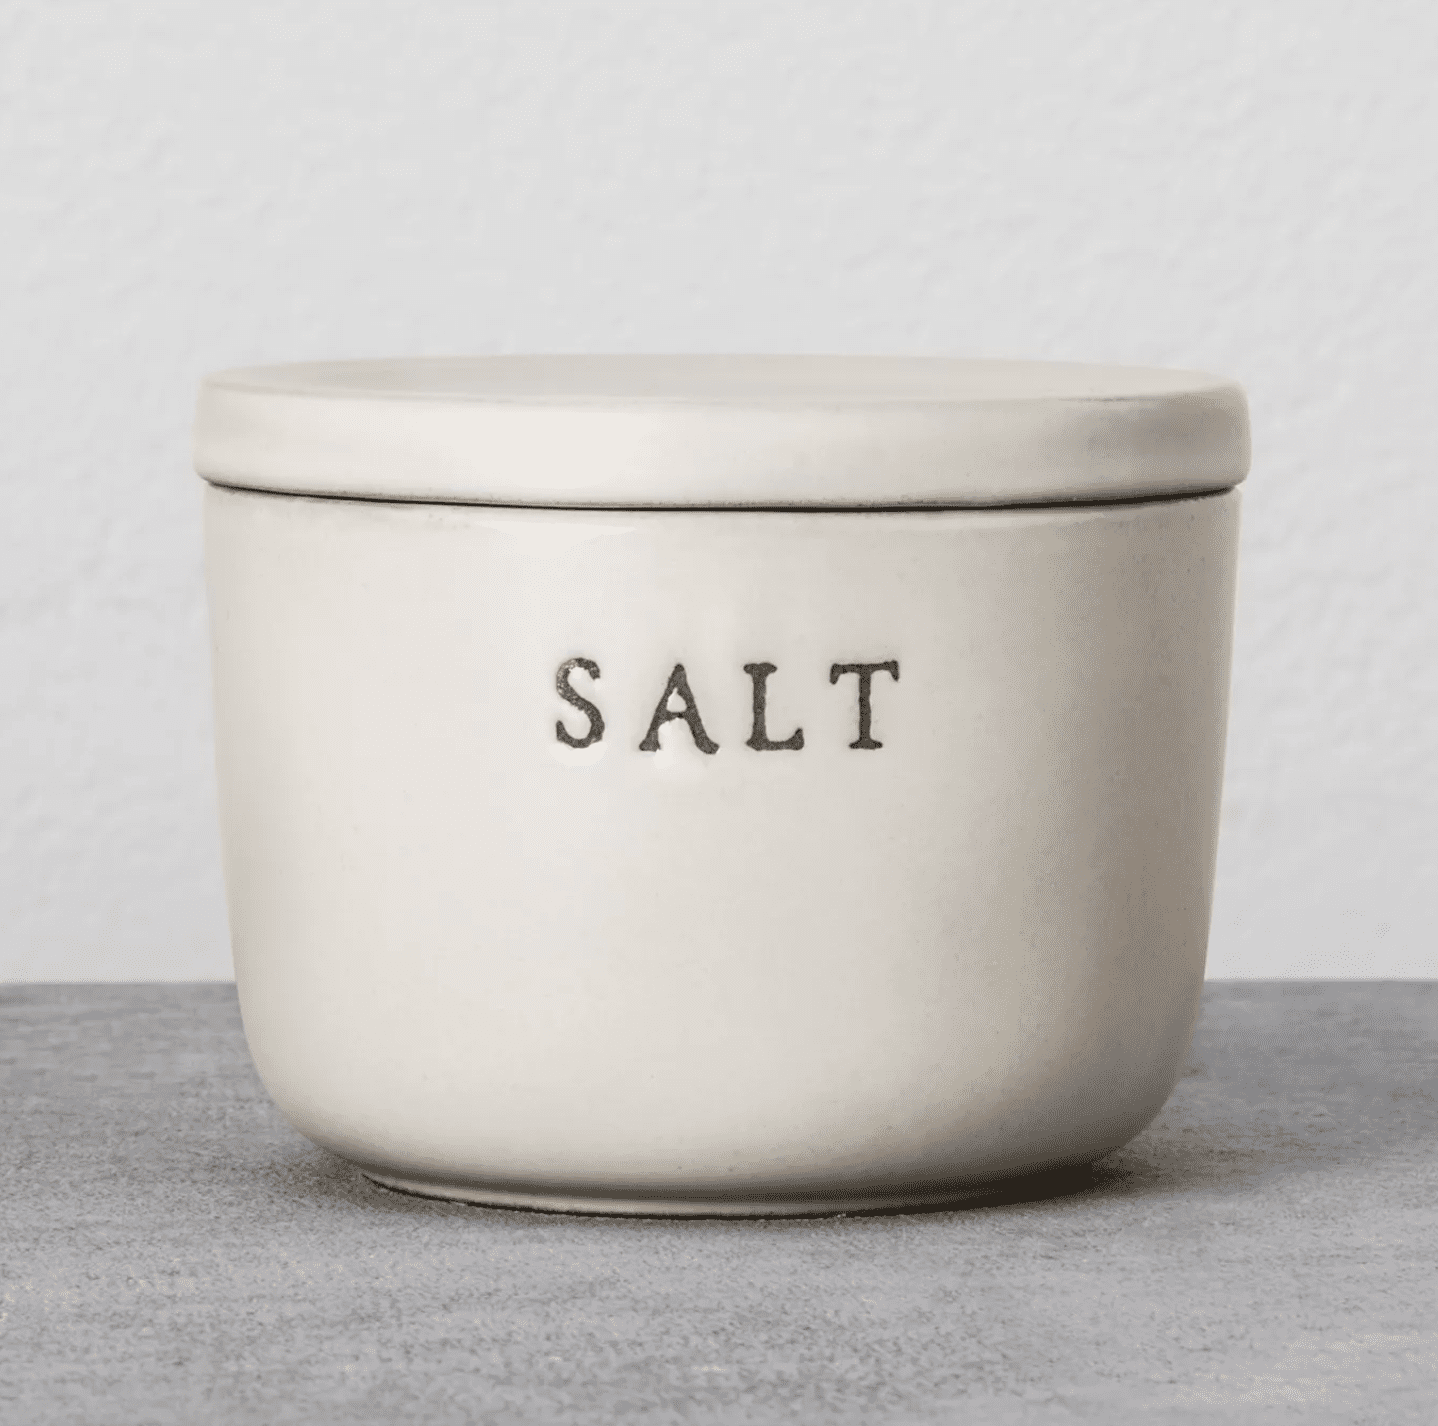 Hearth and Hand Salt Holder